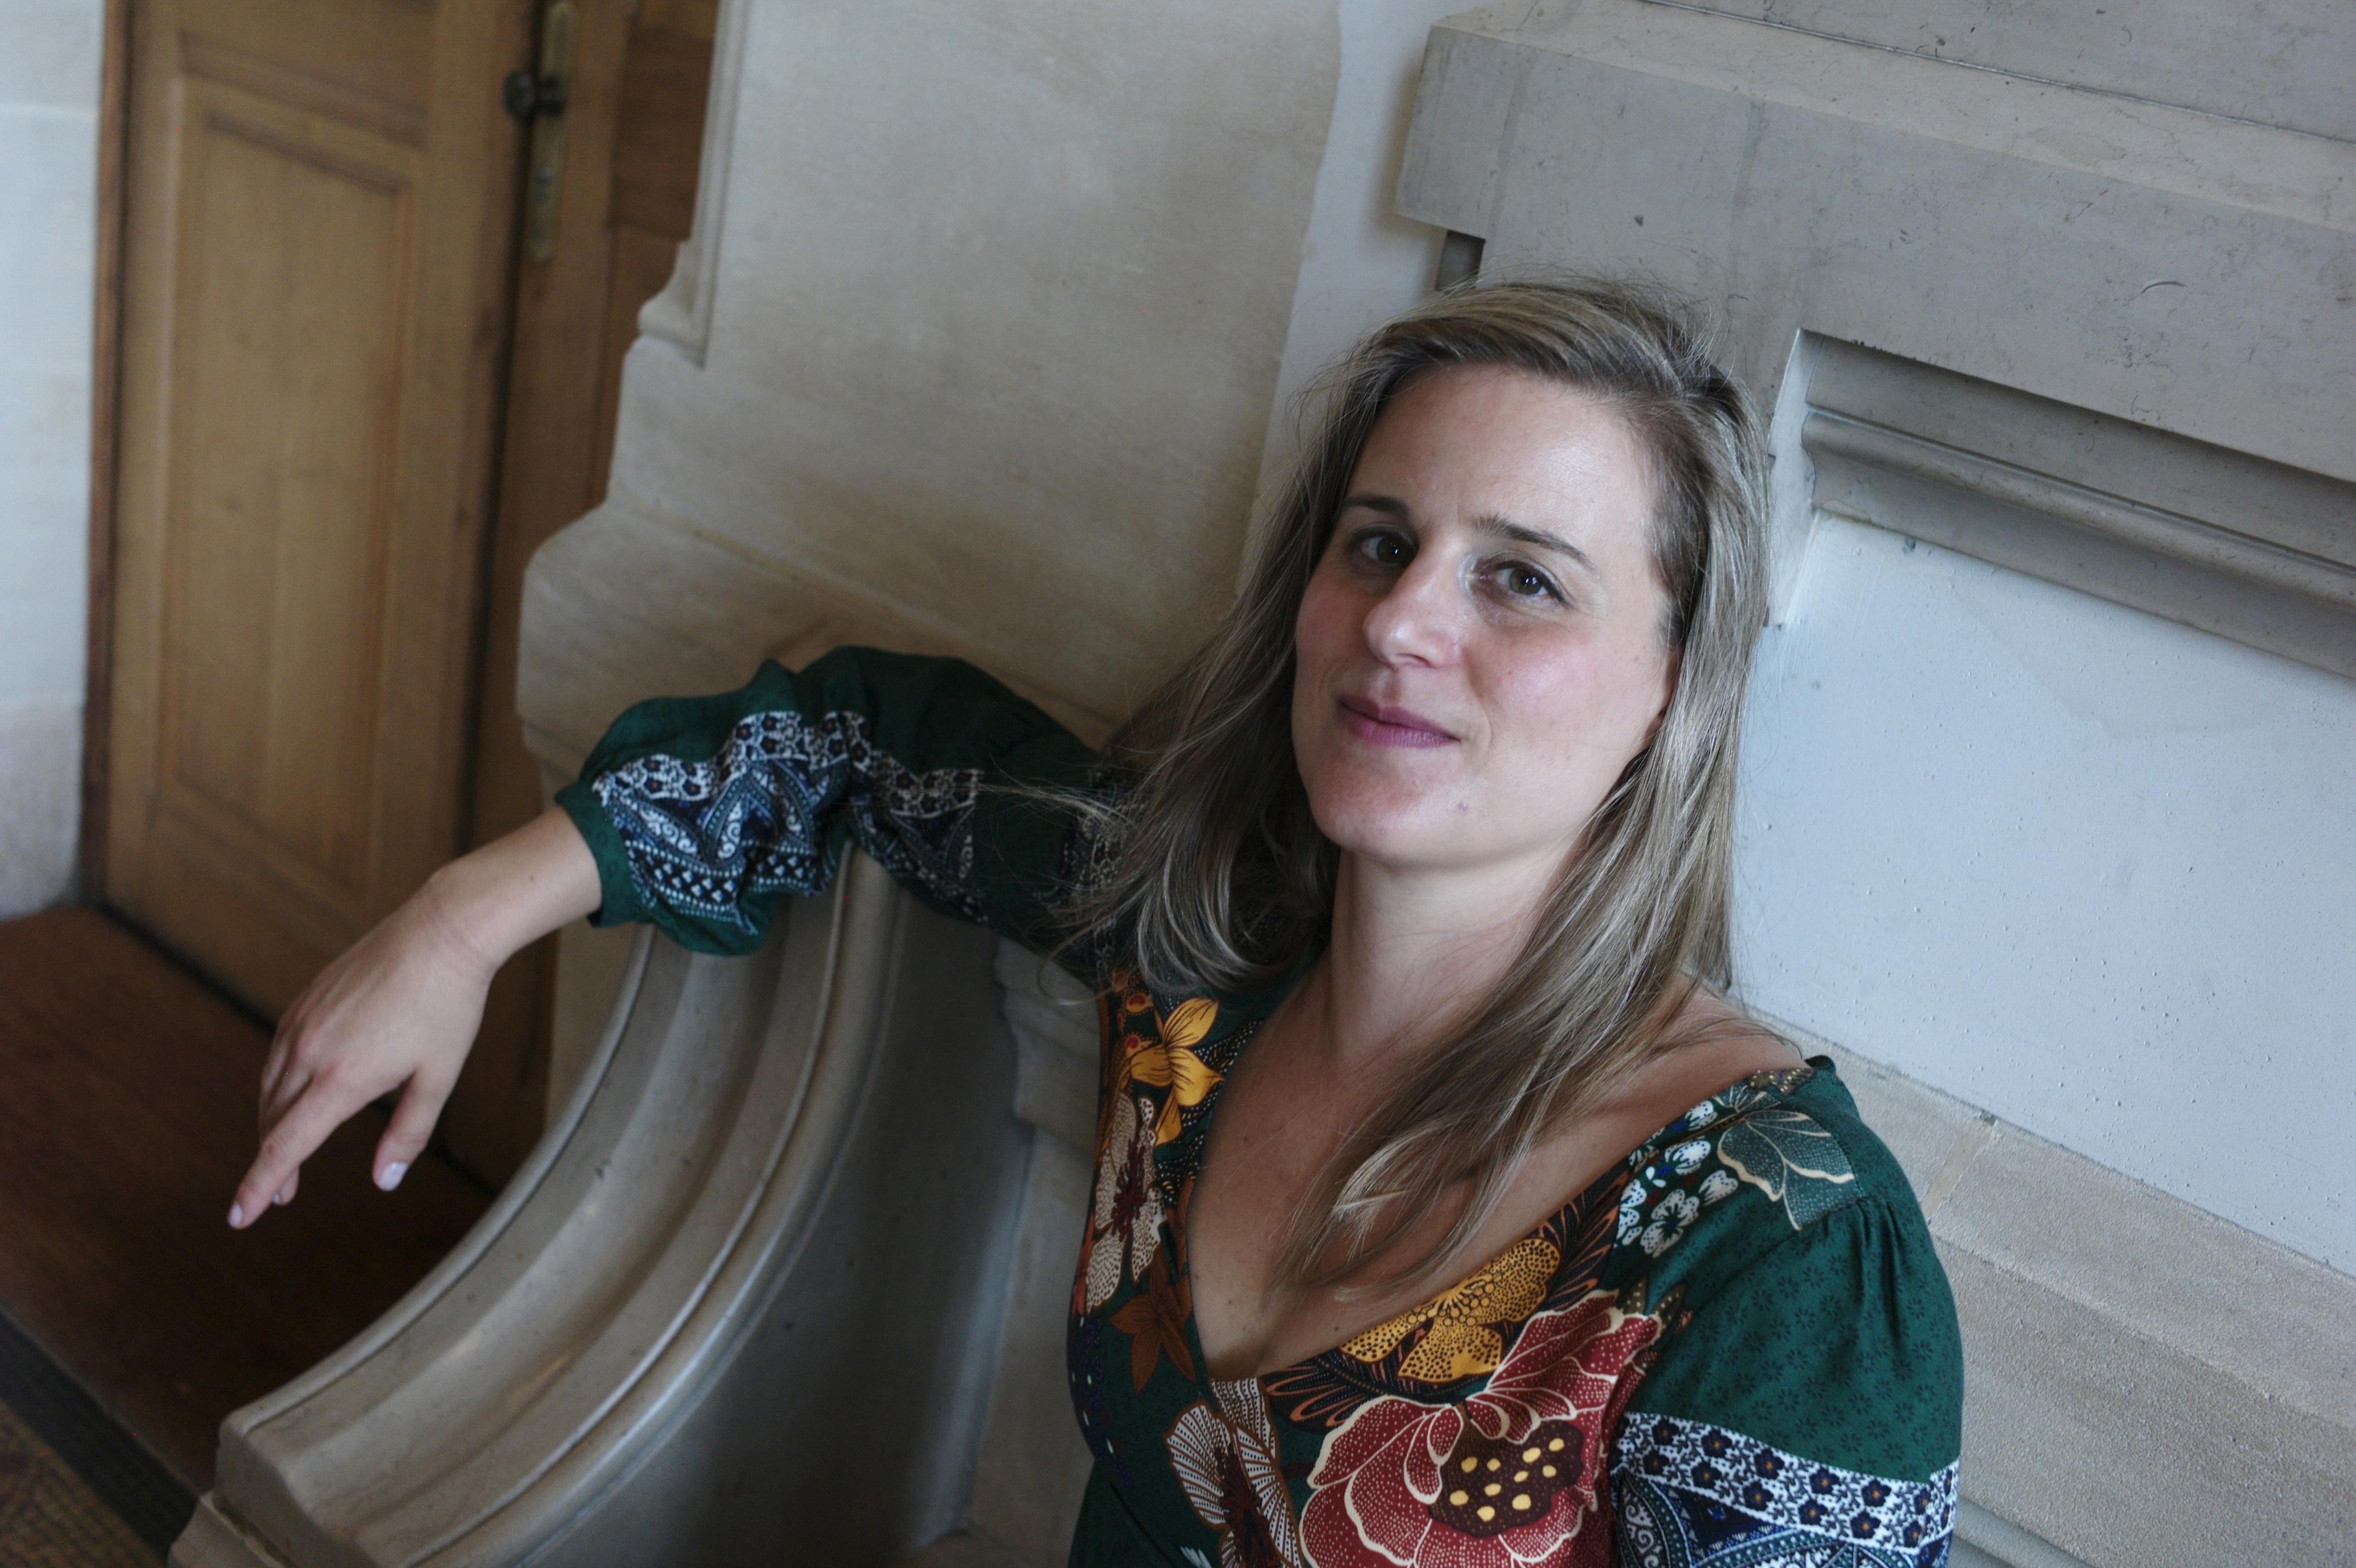 Lauren Groff Curates Greenpeace Artists' Project